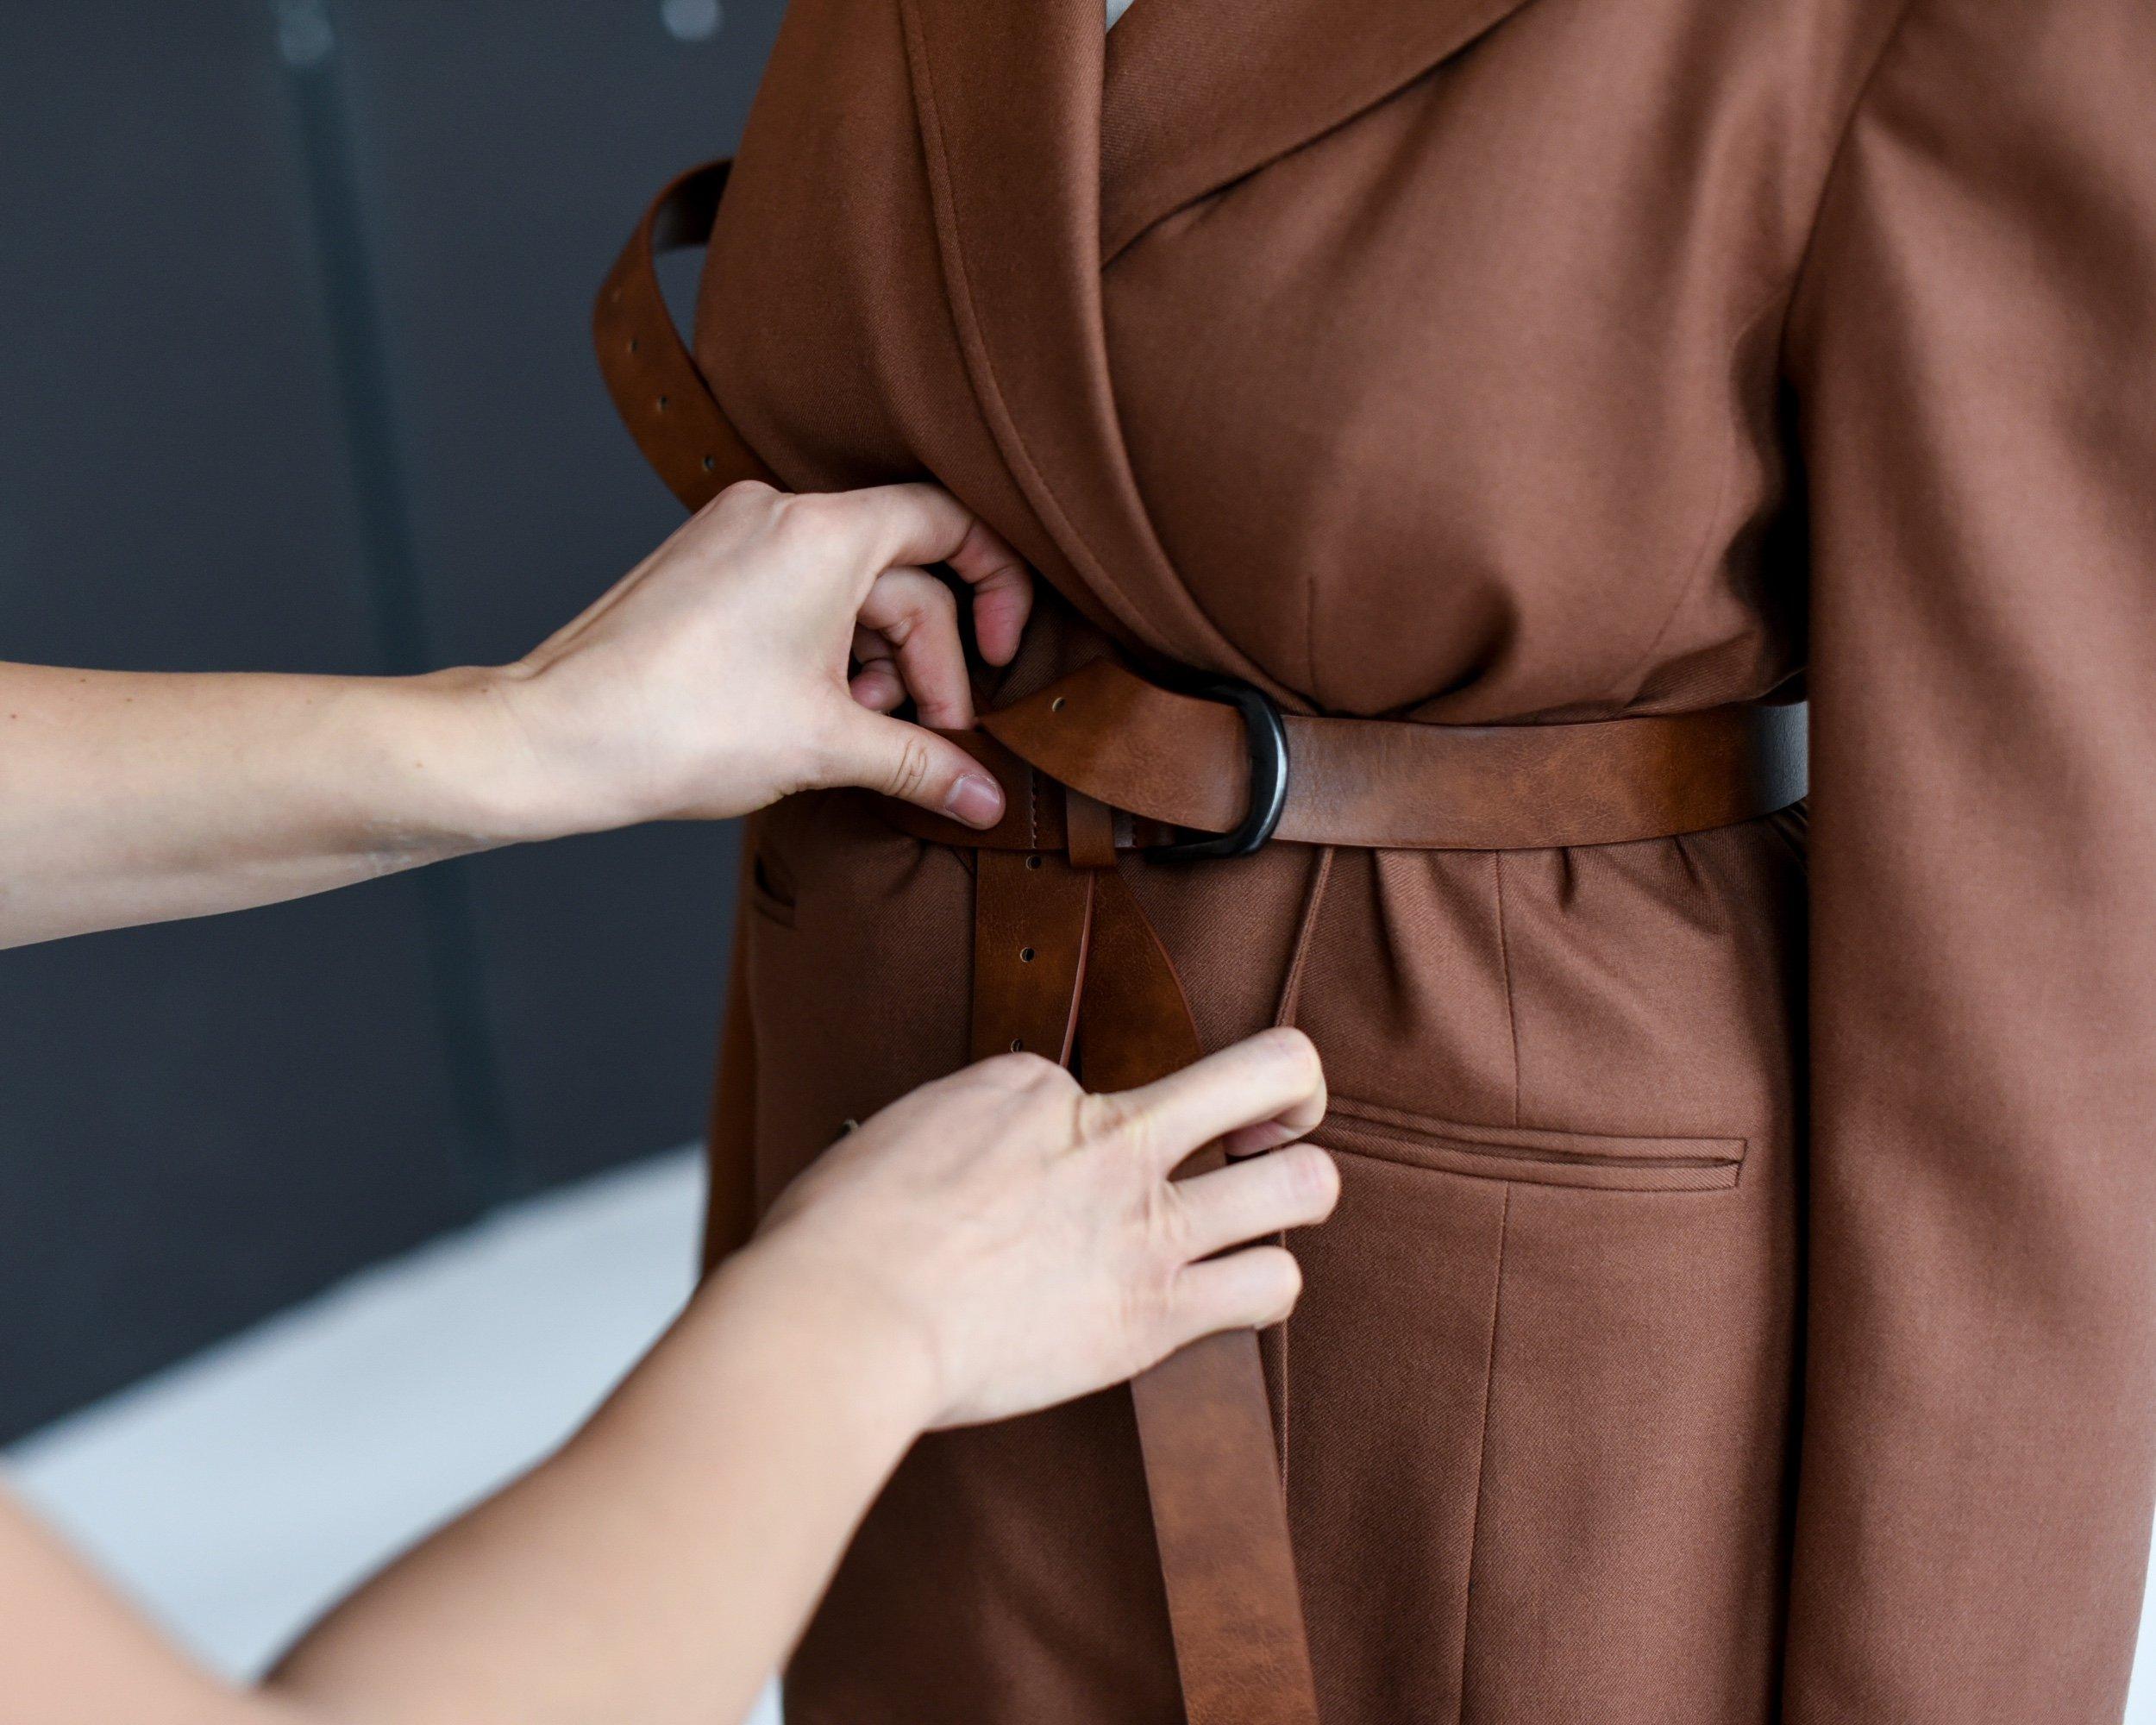 Hands adjust the belt of a brown trench coat